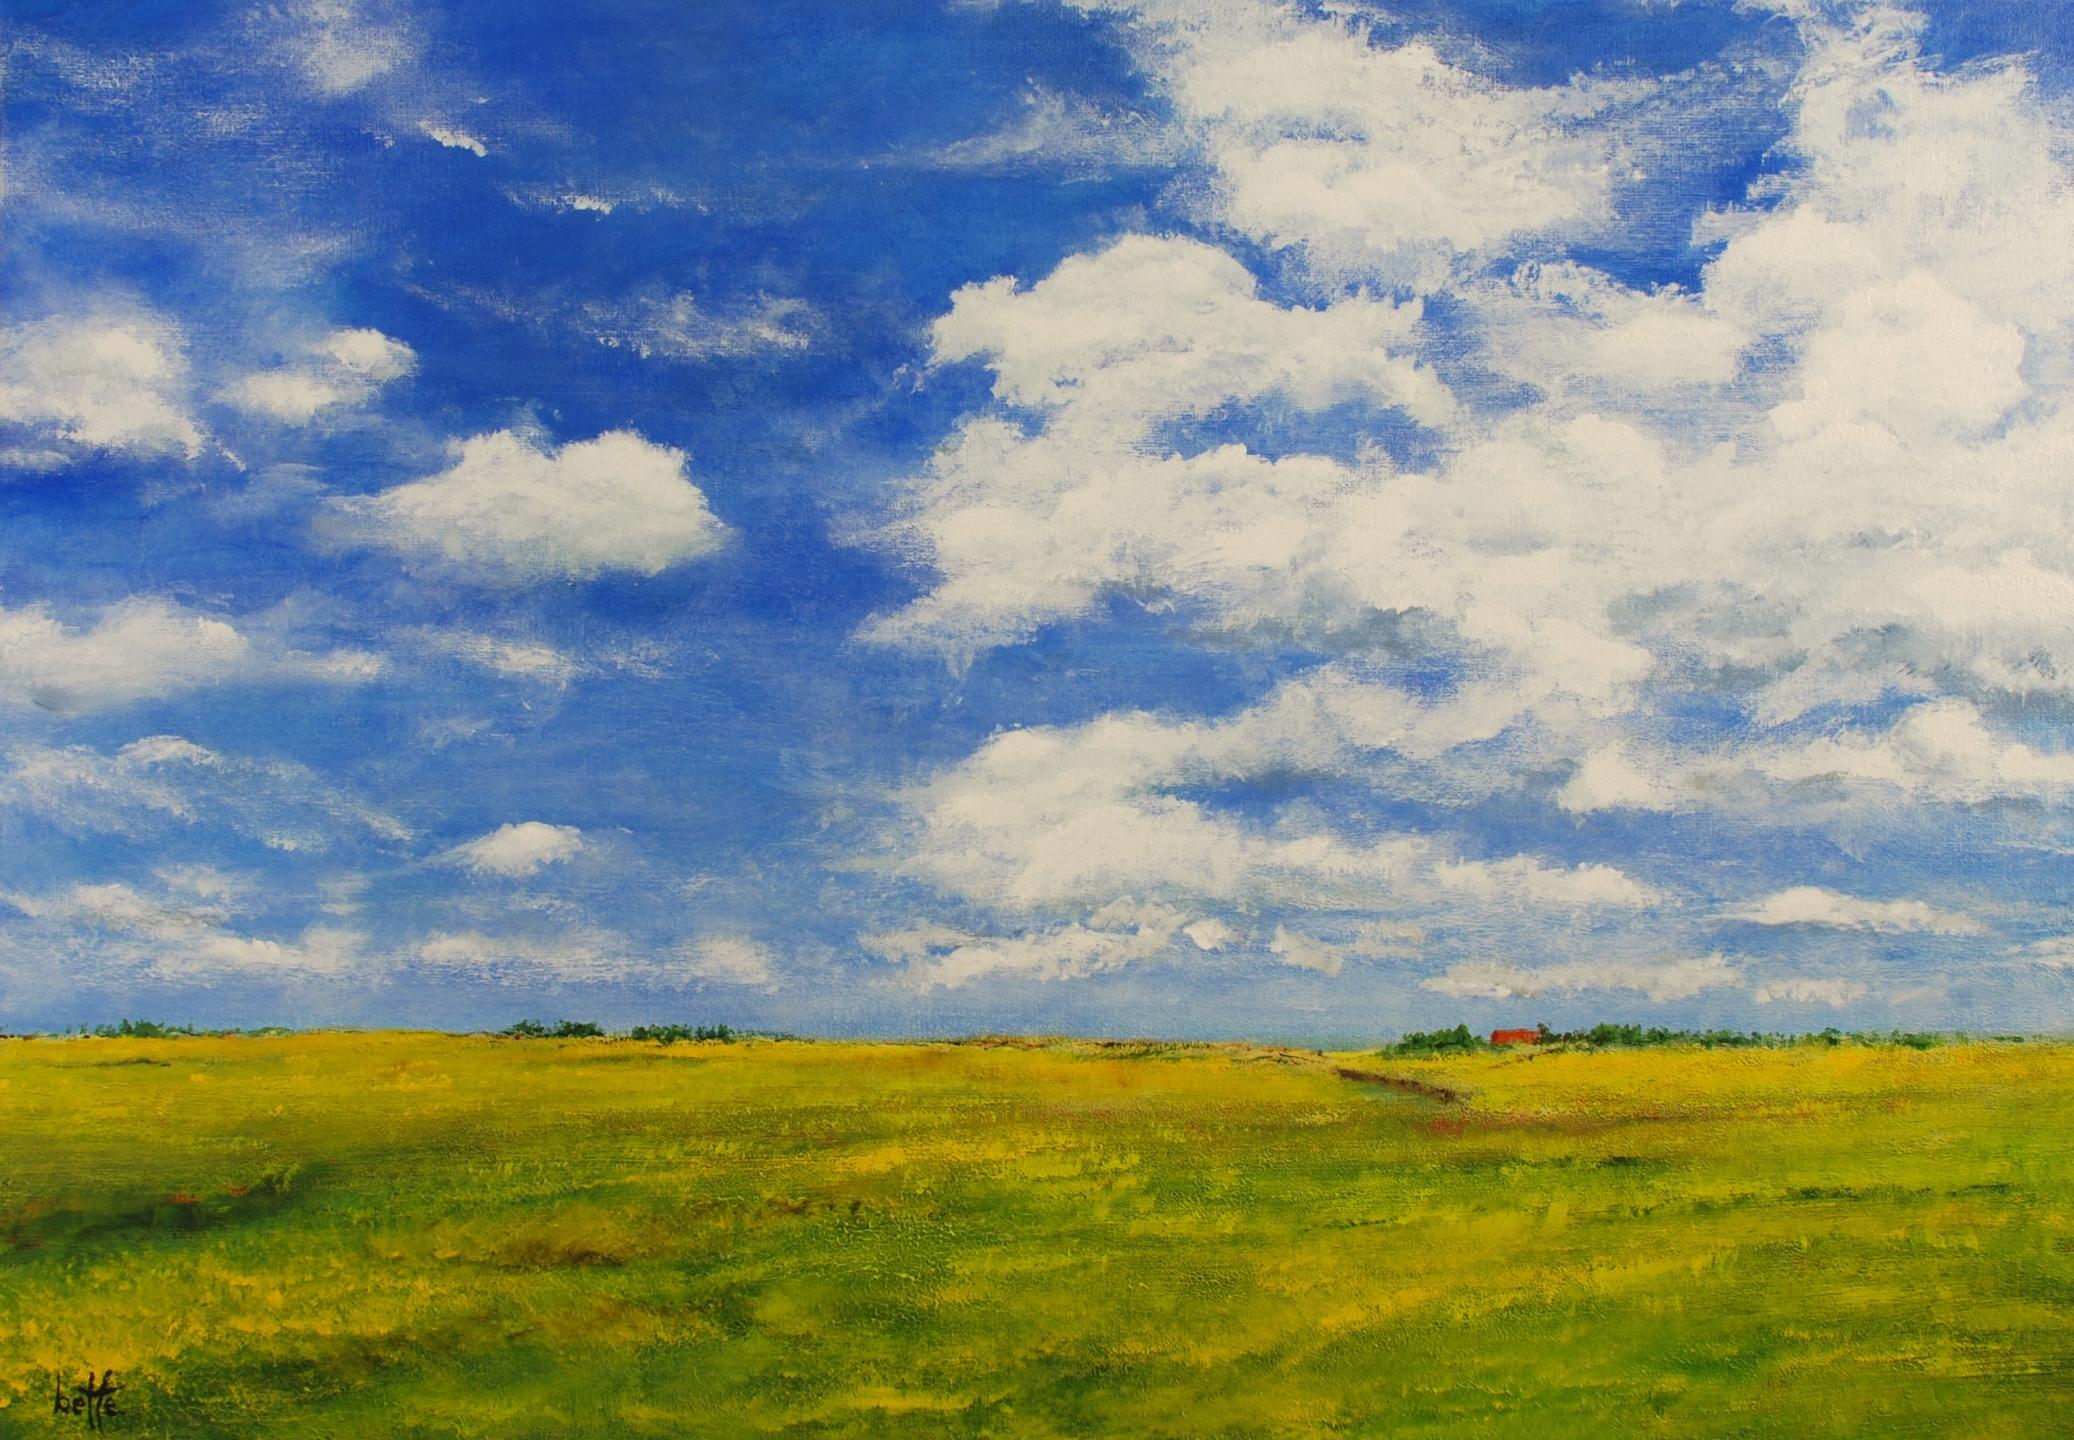 279 - Boven de polder de hemel